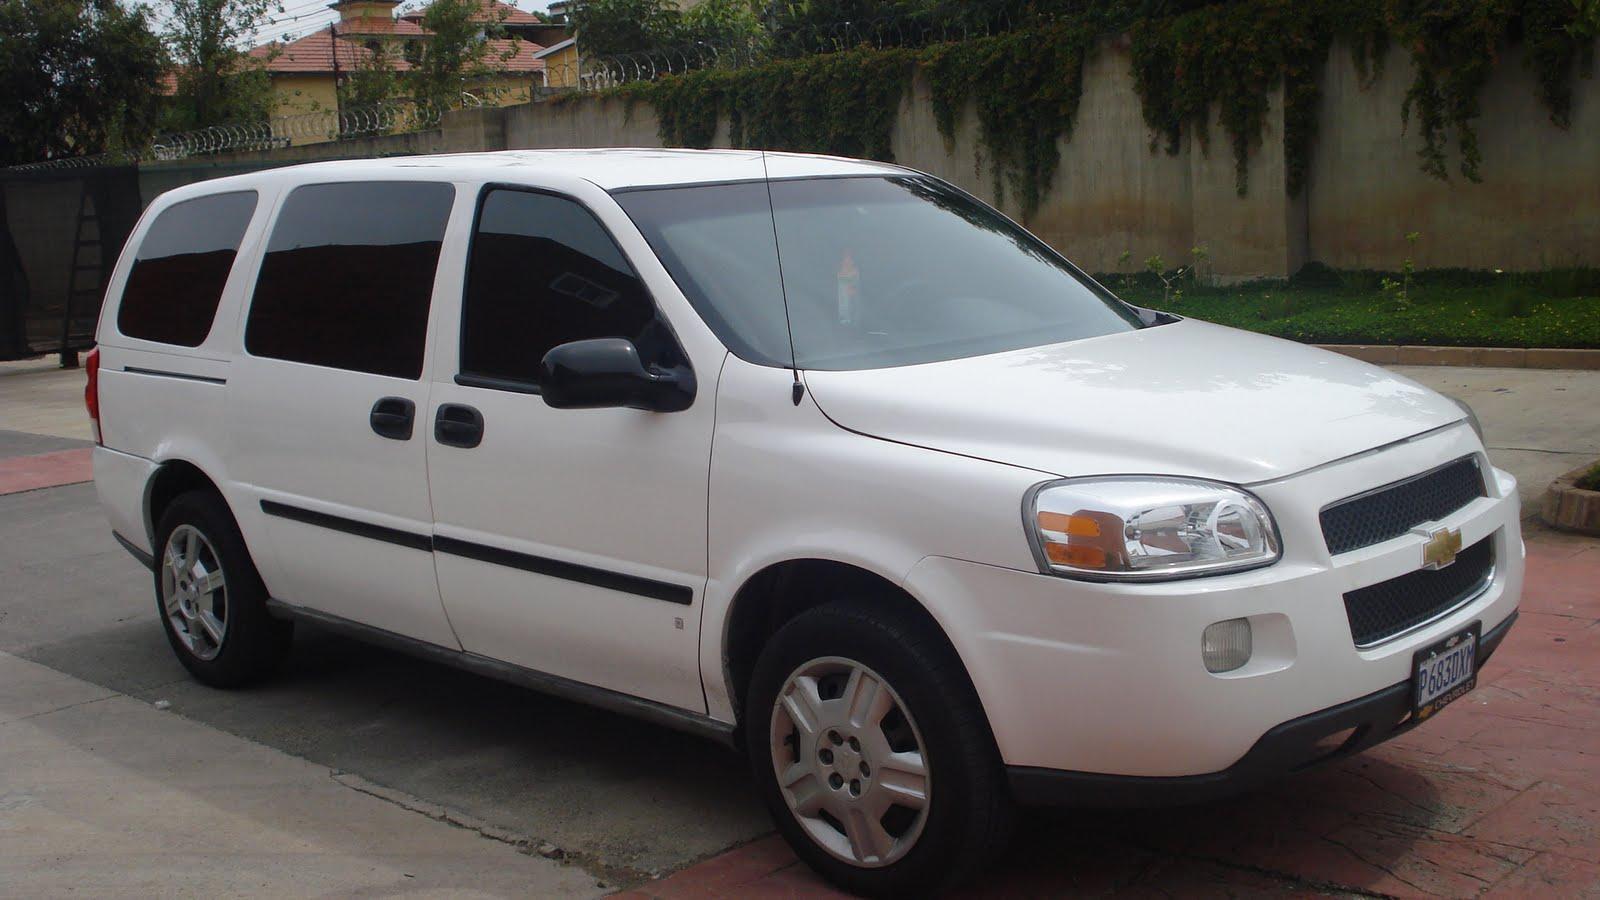 Chevrolet Venture 2006 foto - 1